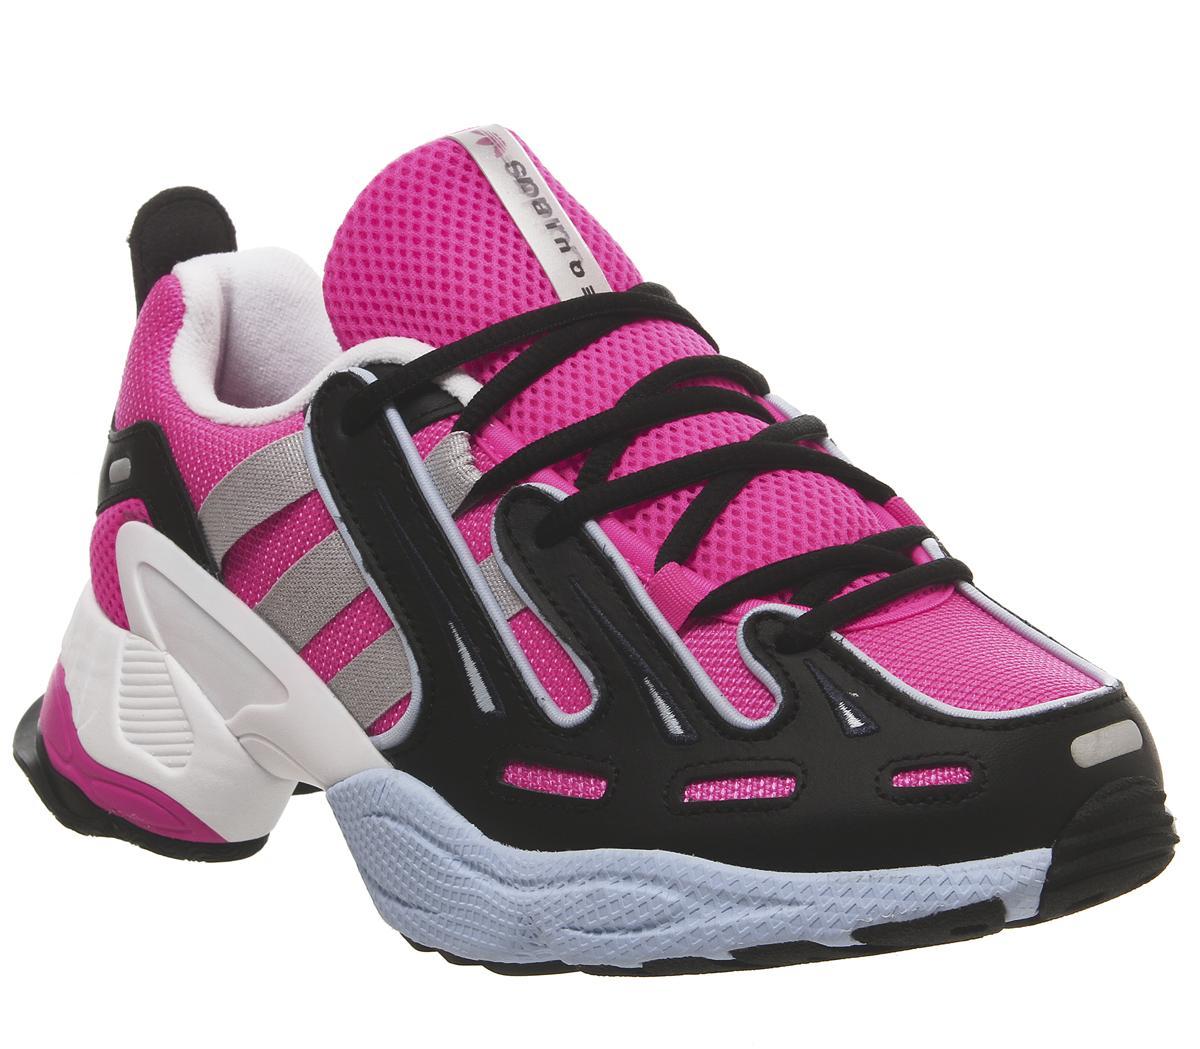 adidas Eqt Gazelle Trainers Shock Pink